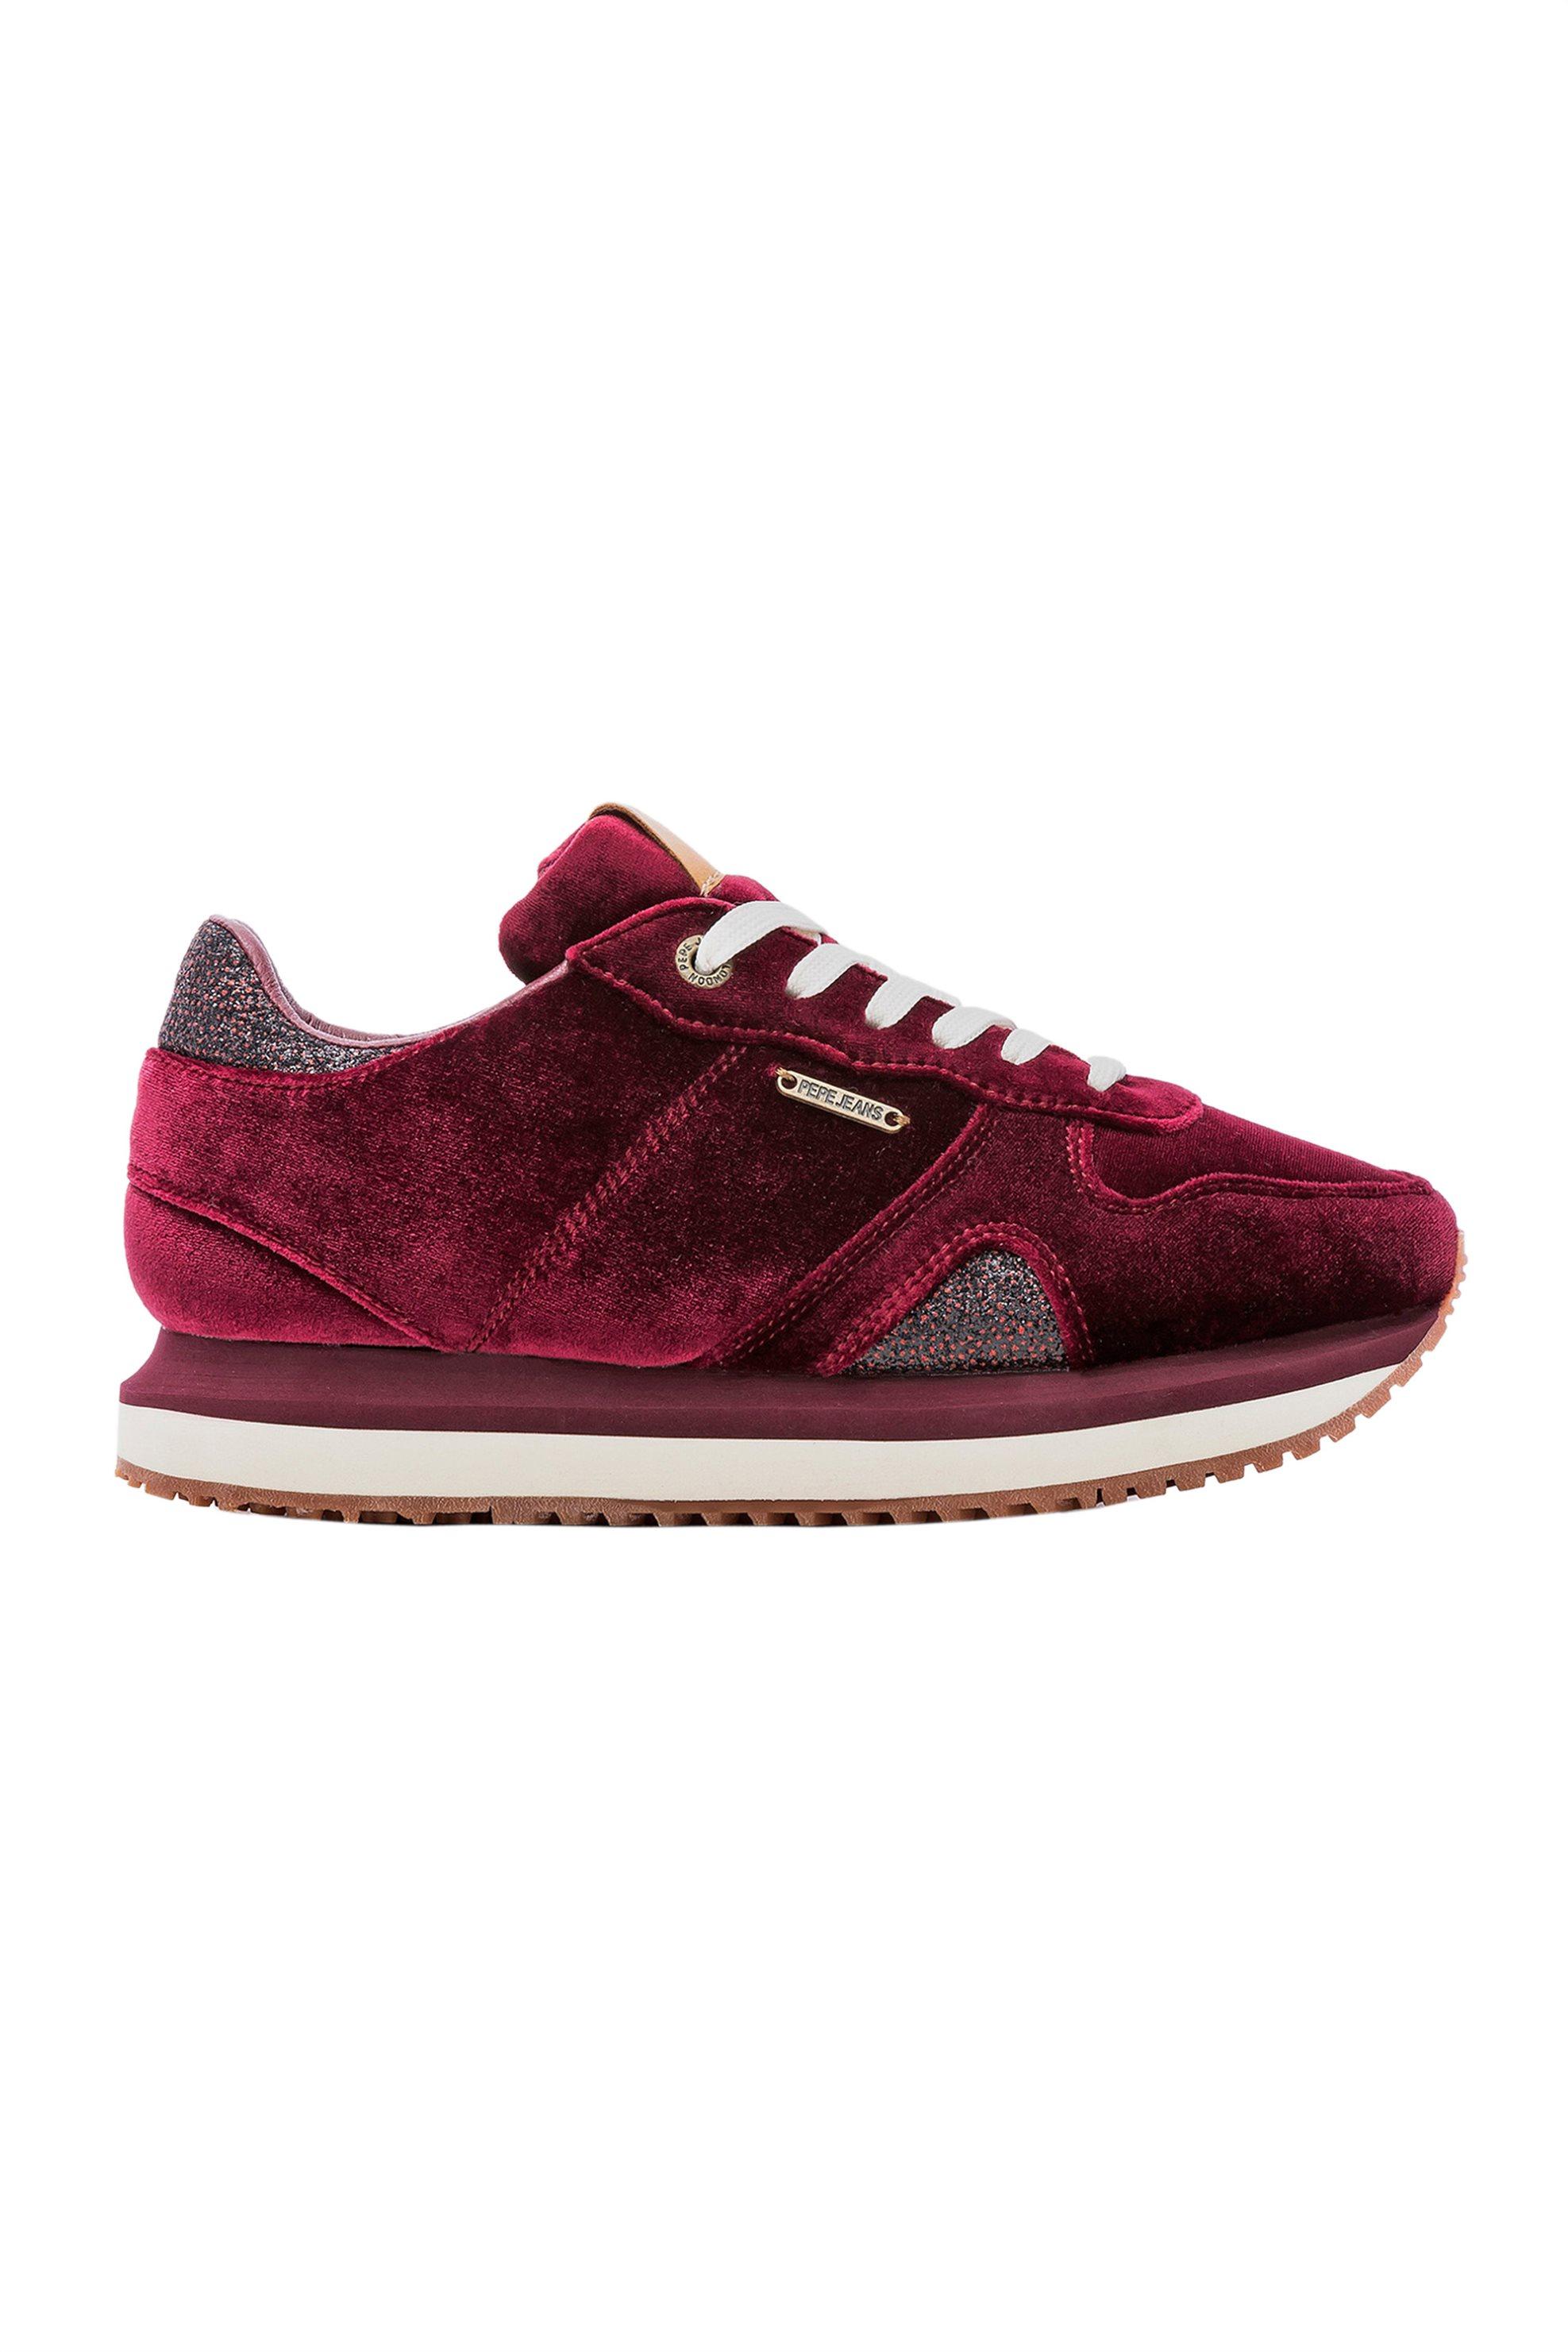 1f97b2ce22f -30% Notos Pepe Jeans γυναικεία παπούτσια trainers Zion Velvet – PLS30786 –  Μπορντό